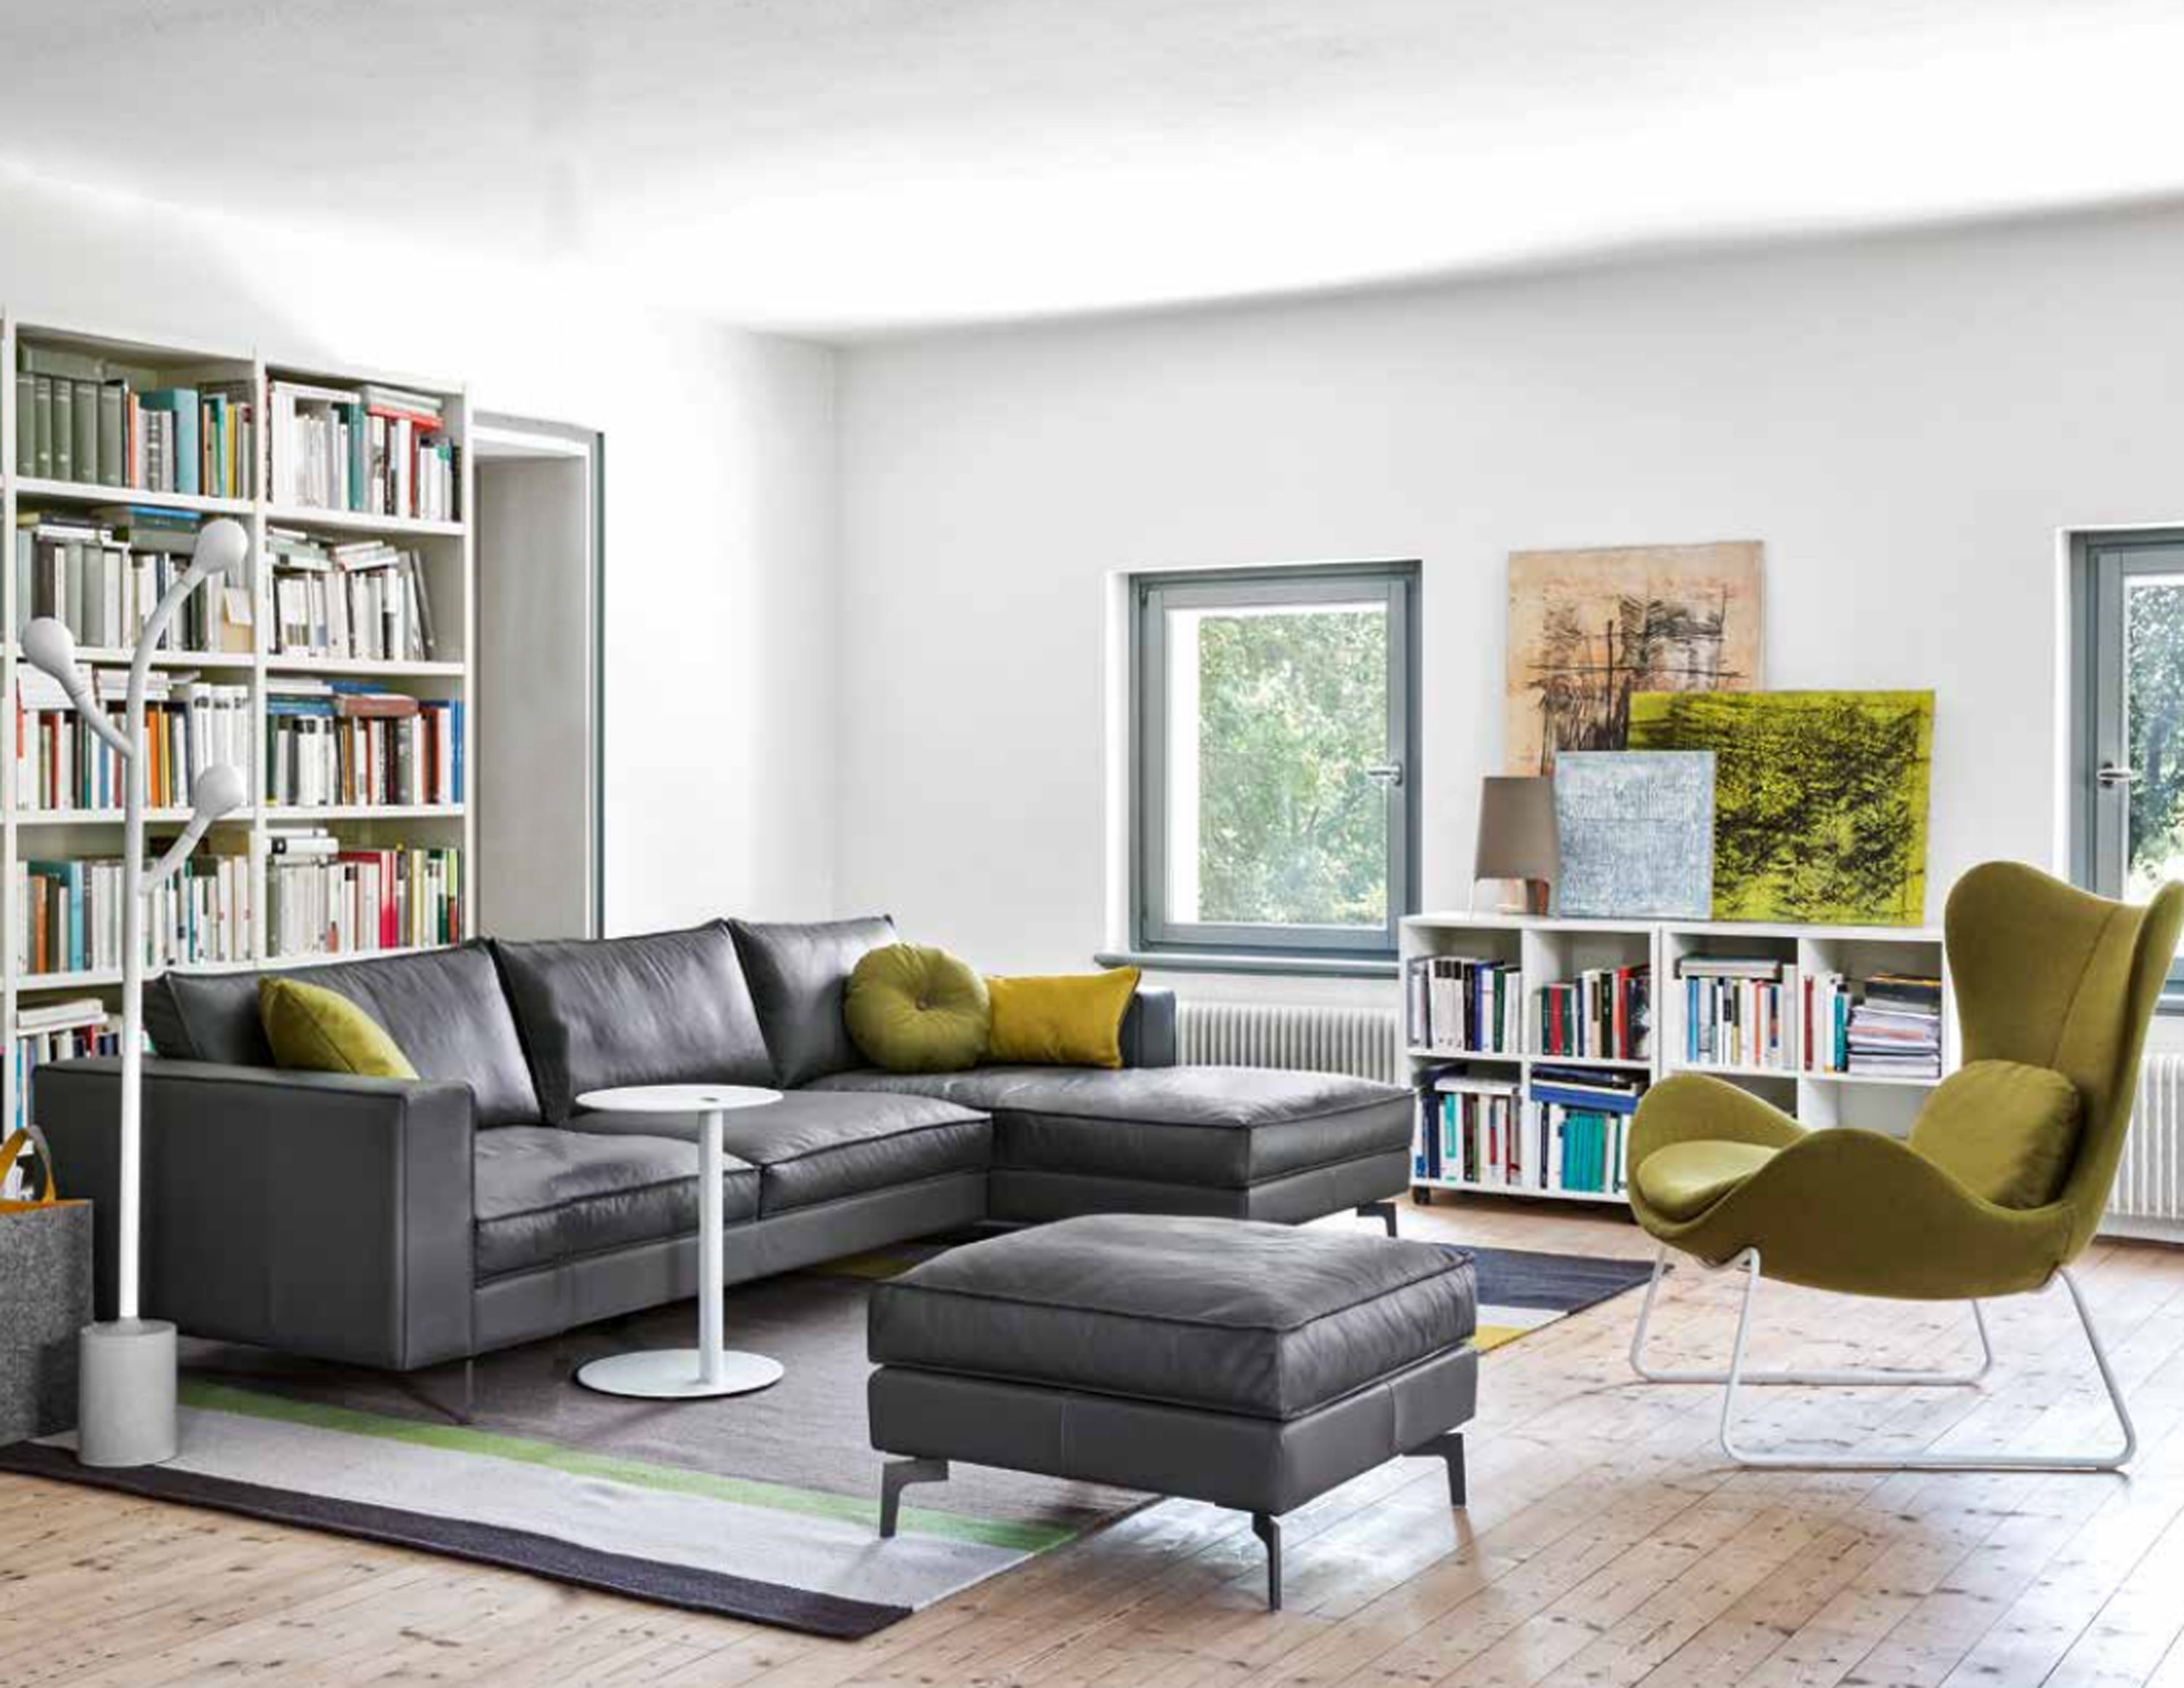 Calligaris Living Room Find More Calligaris Furniture And Expert Design